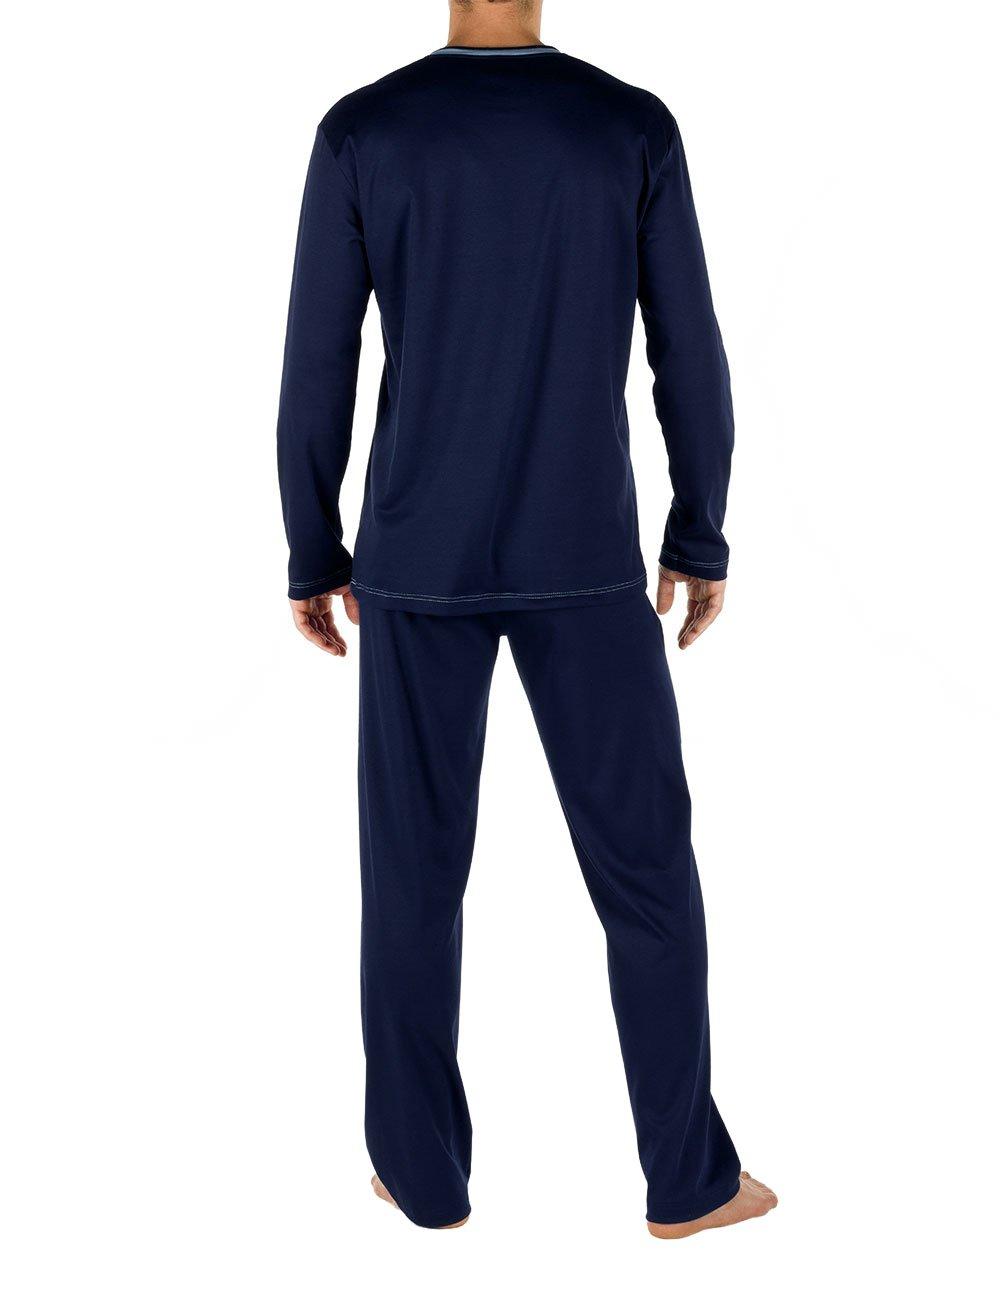 Calida Chill Out 100% Cotton Pajama Set (43162) L/Dark Blue by Calida (Image #2)